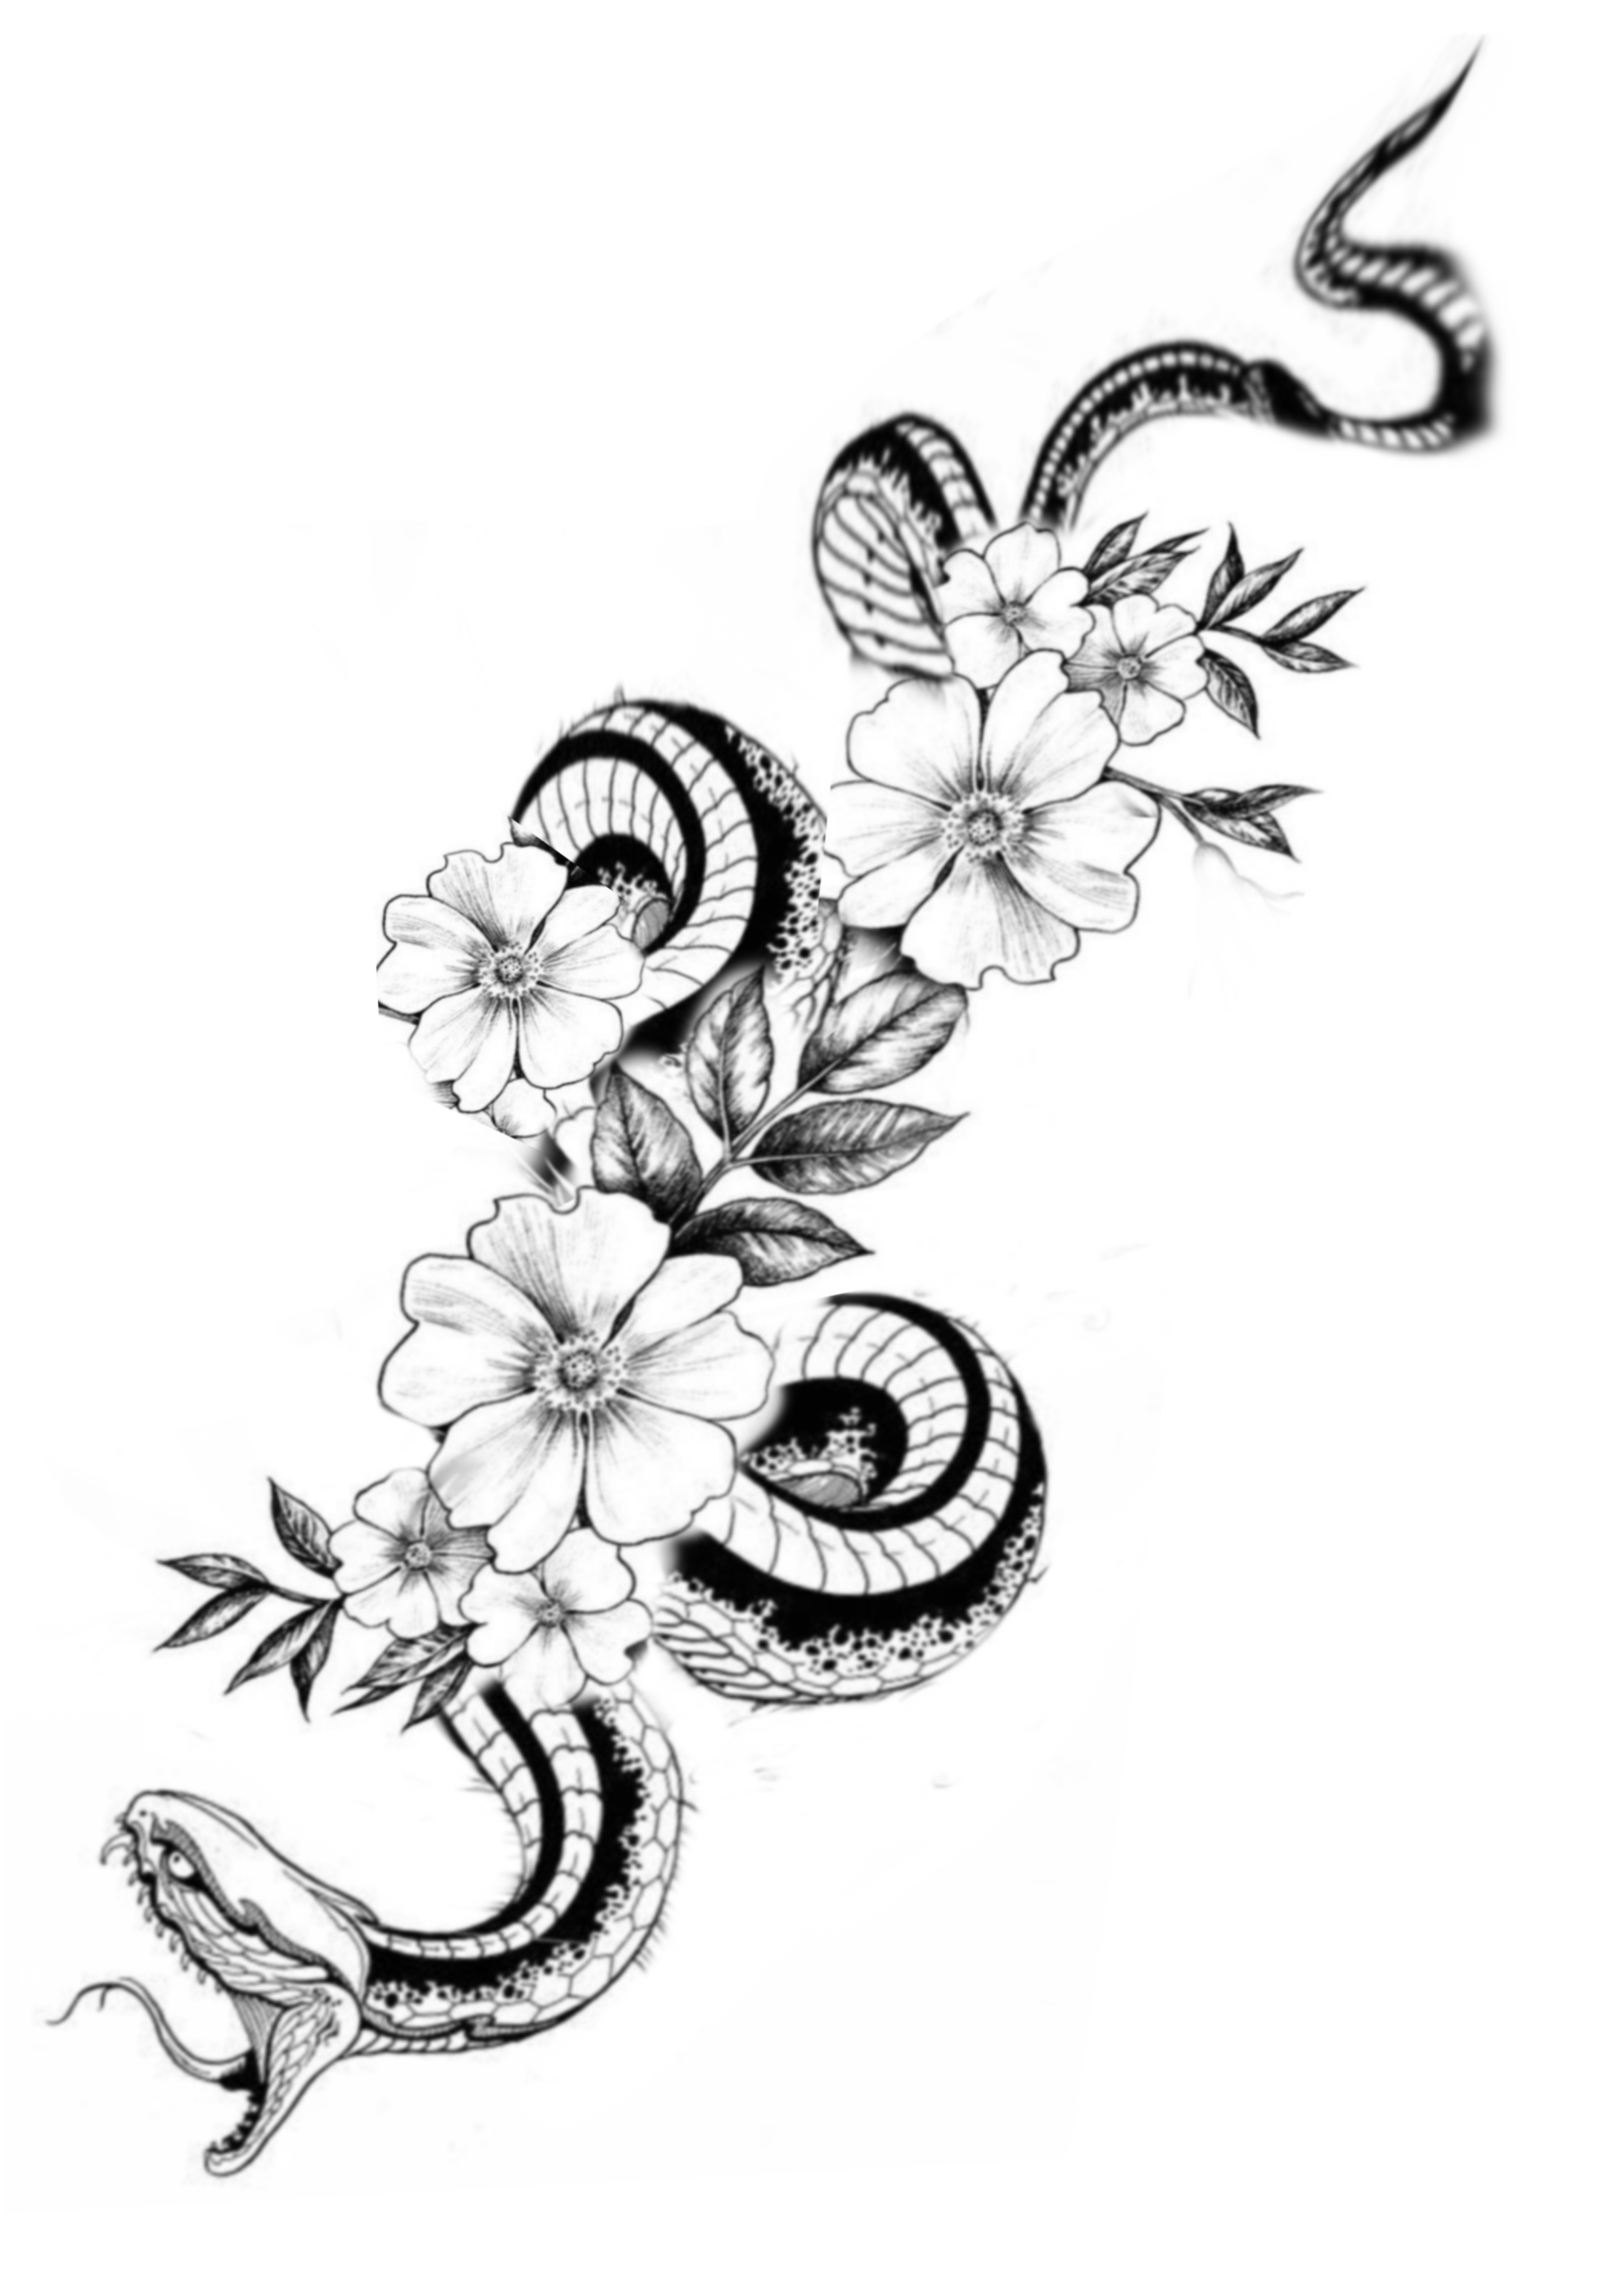 Pin By Zoomi On Mirtes Body Art Tattoos Rose Tattoos Sleeve Tattoos